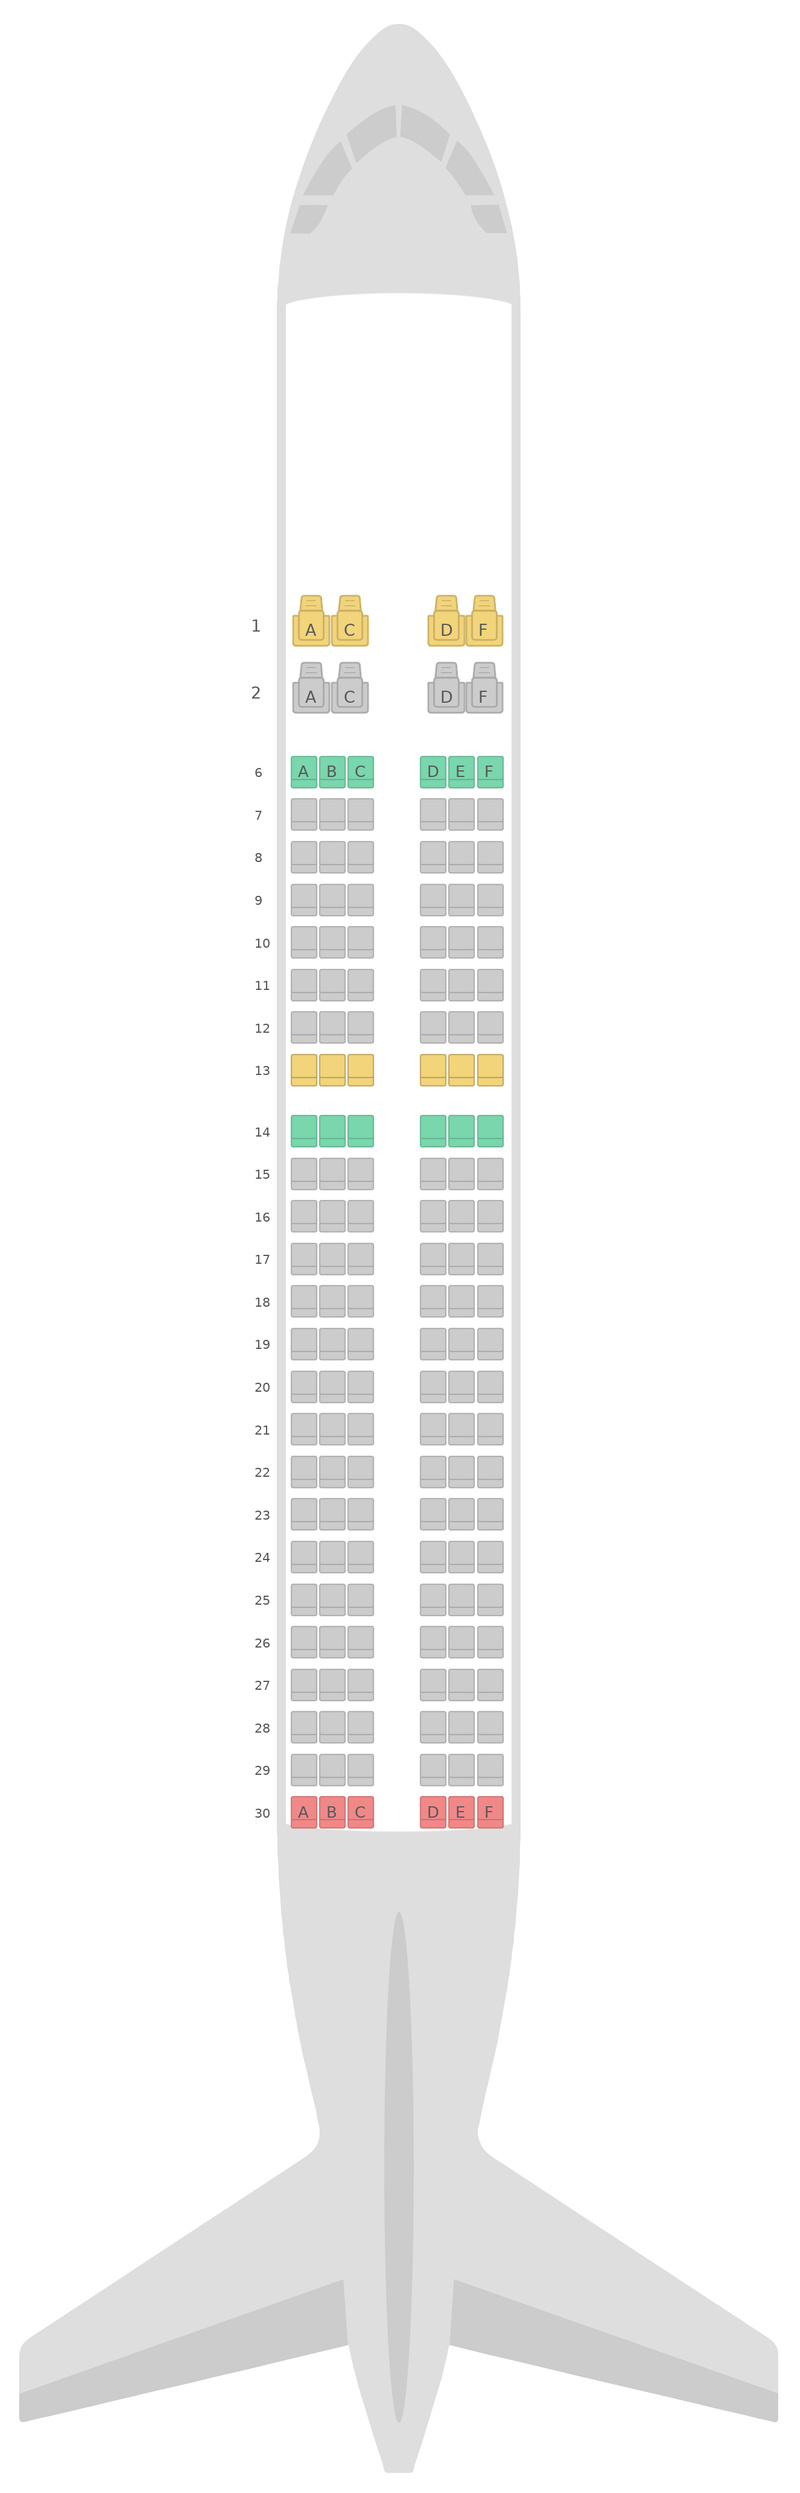 Схема салона Аэробус А320 v2  Аэрофлот